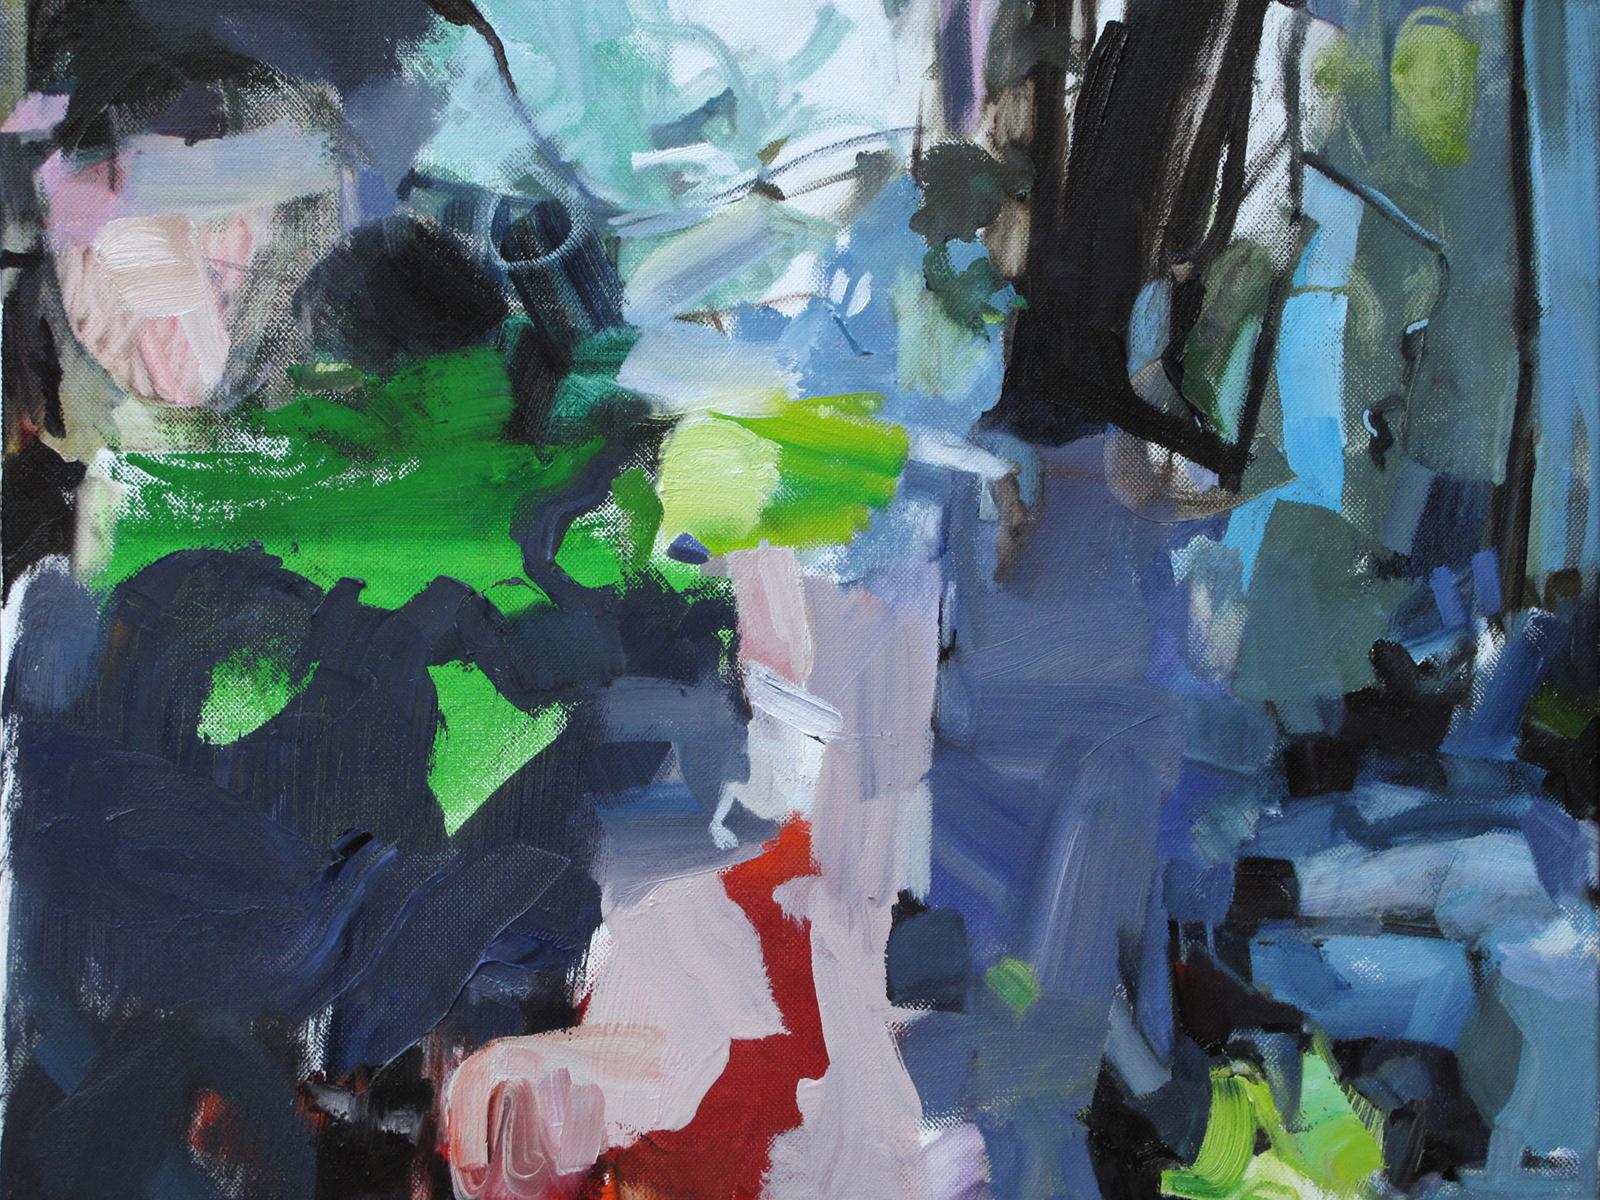 D Morgan Russell, untitled, 2010 Recipient